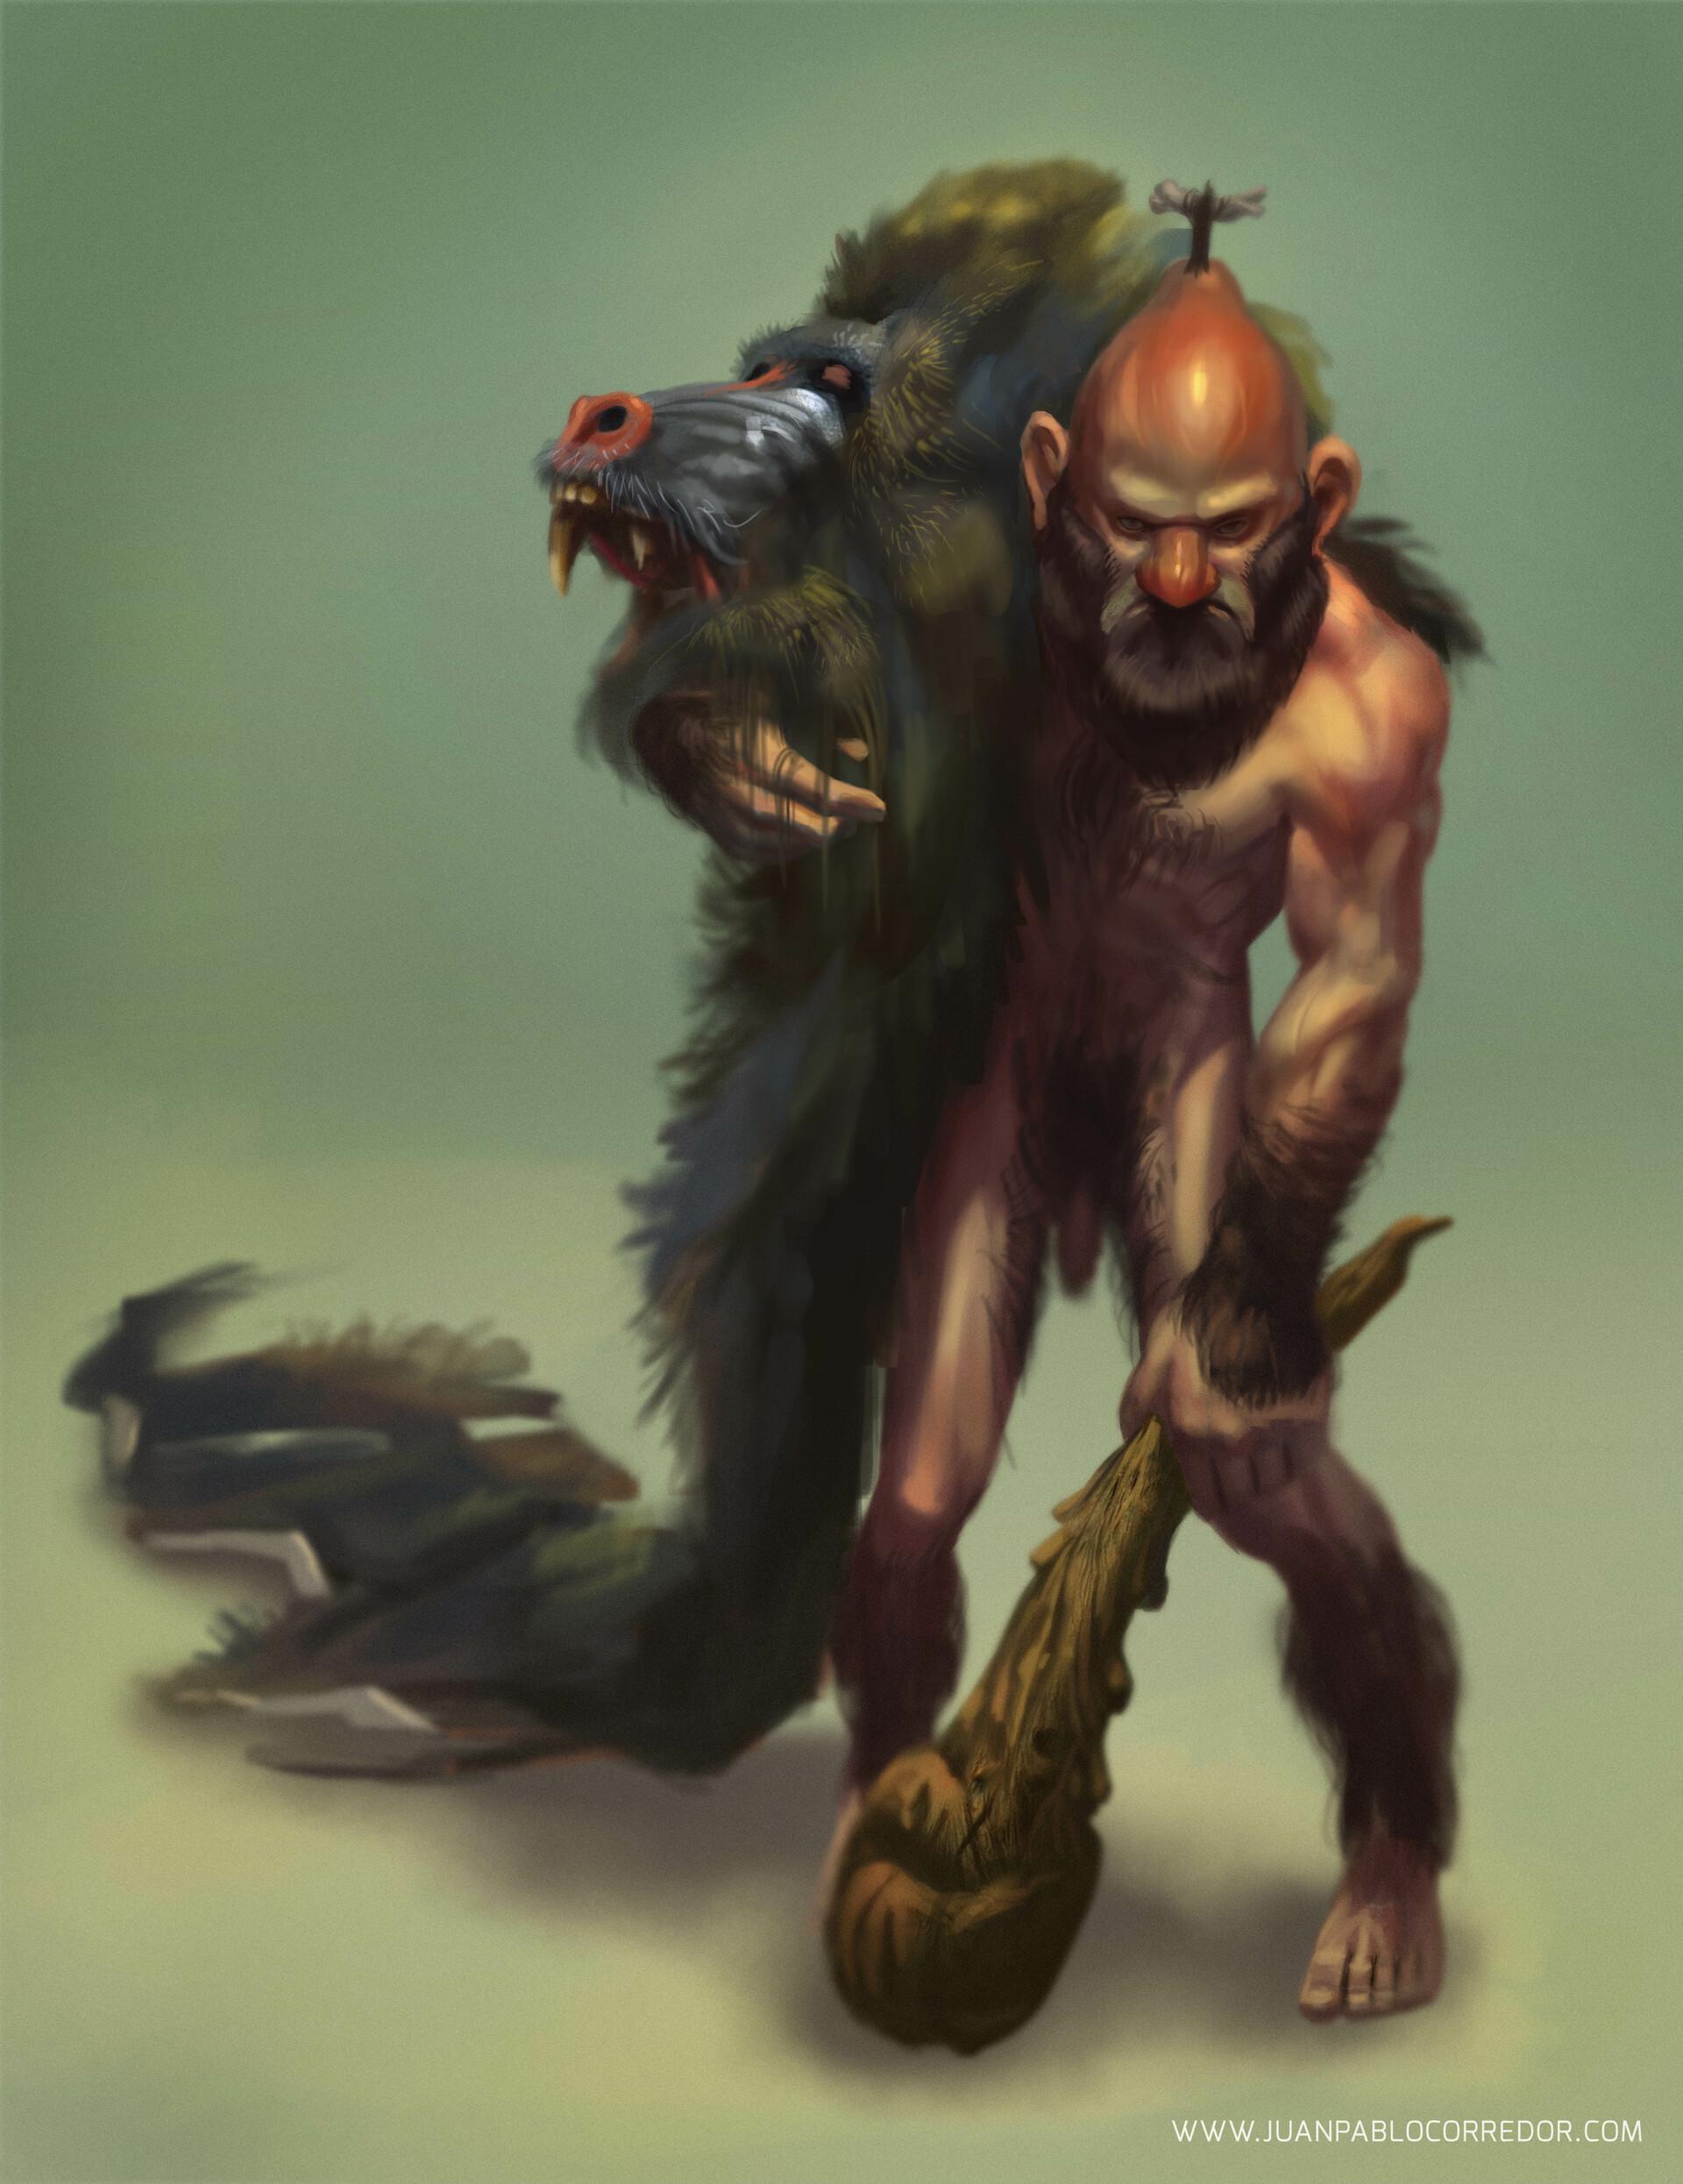 Juan pablo corredor caveman 2